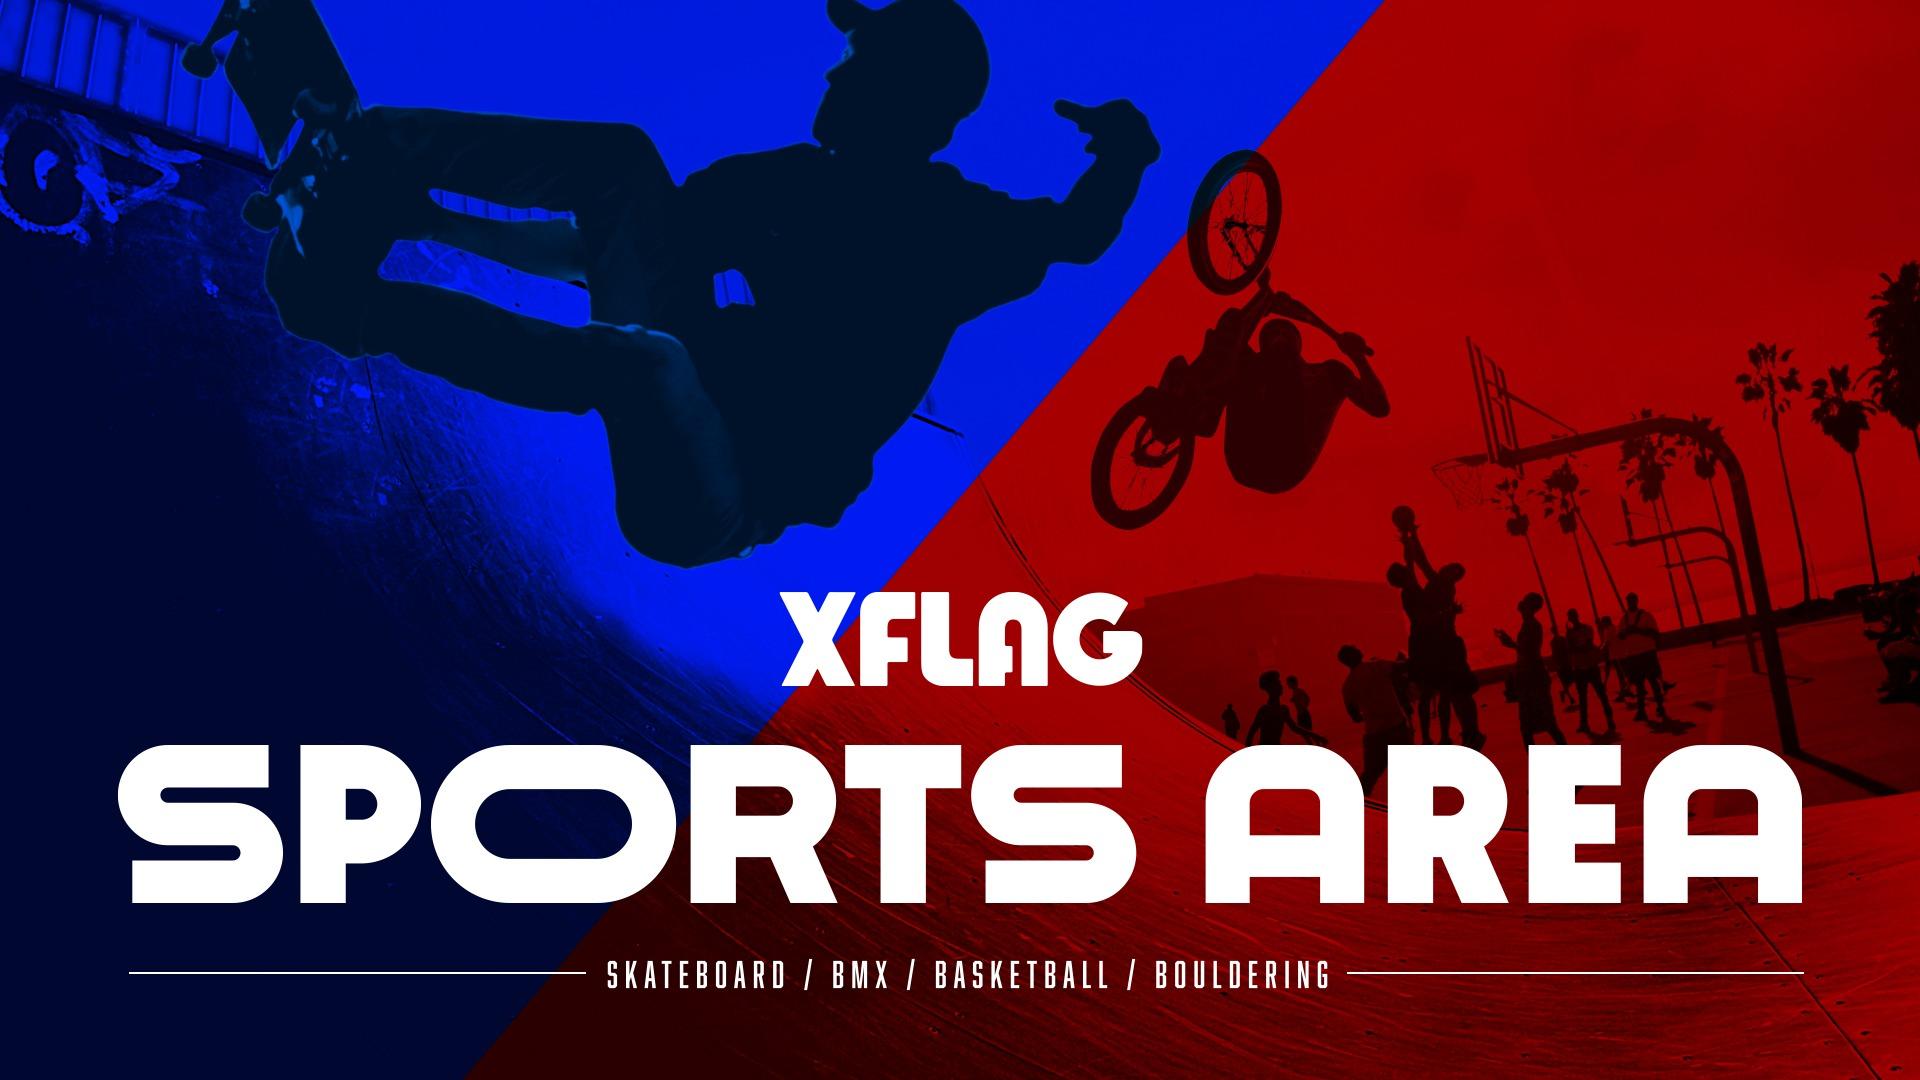 「XFLAG SPORTS AREA」